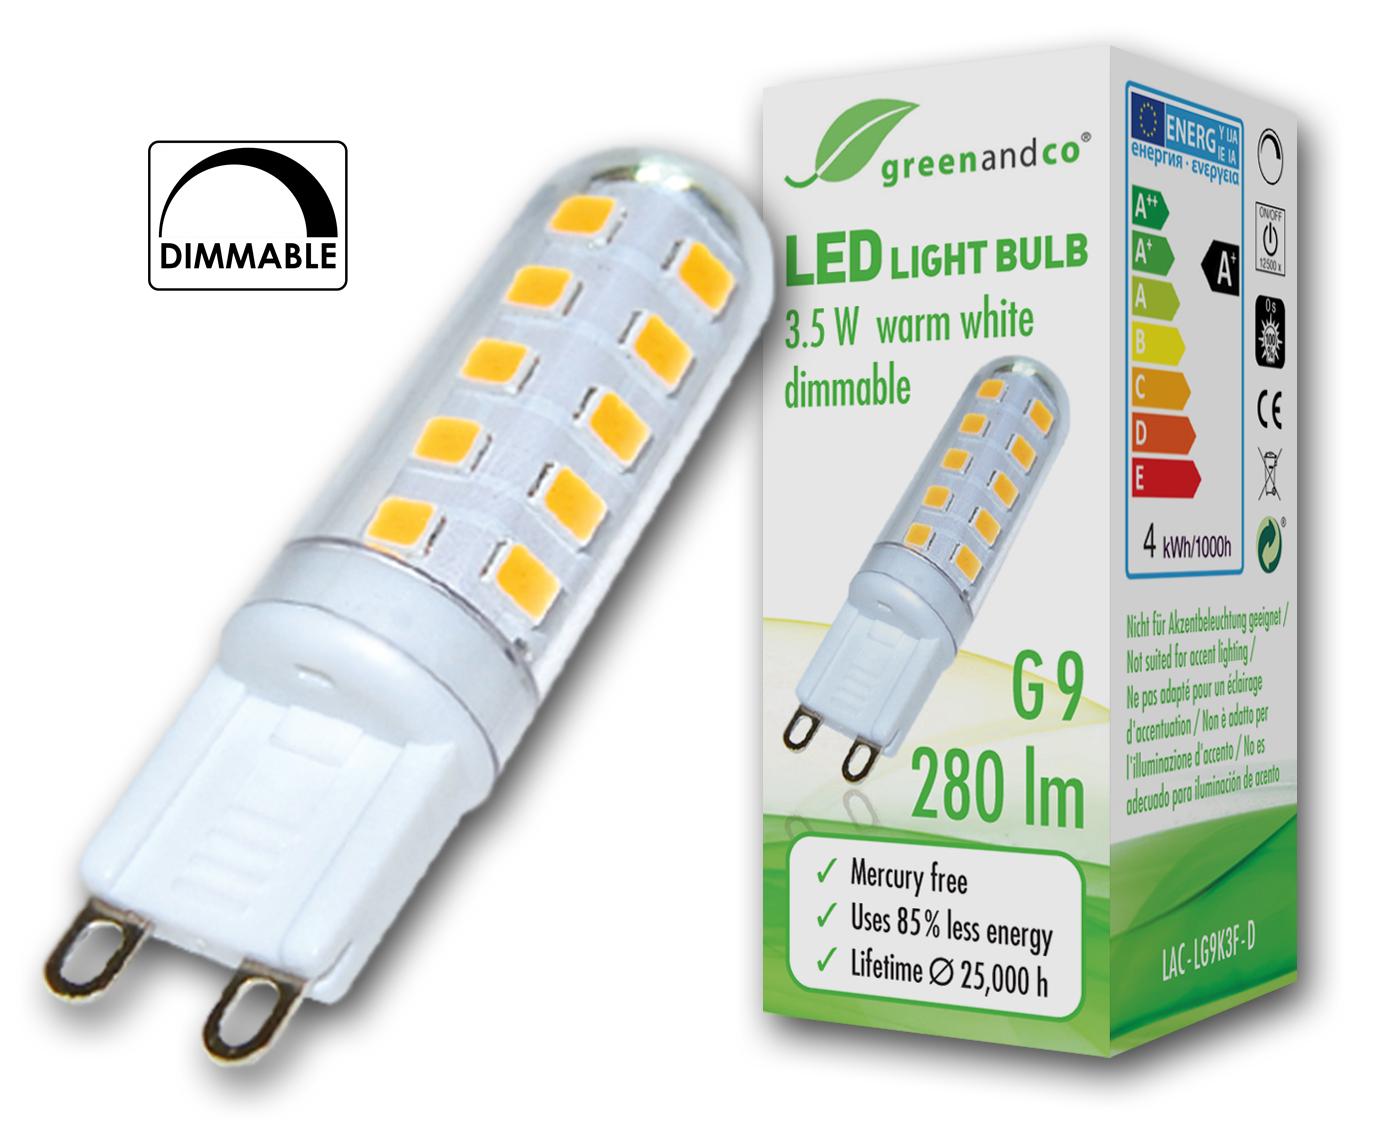 Led Lampe Dimmbar Ersetzt 25 35w G9 3 5w 280lm 3000k Warmweiß 270 230v 2 Jahre Garantie